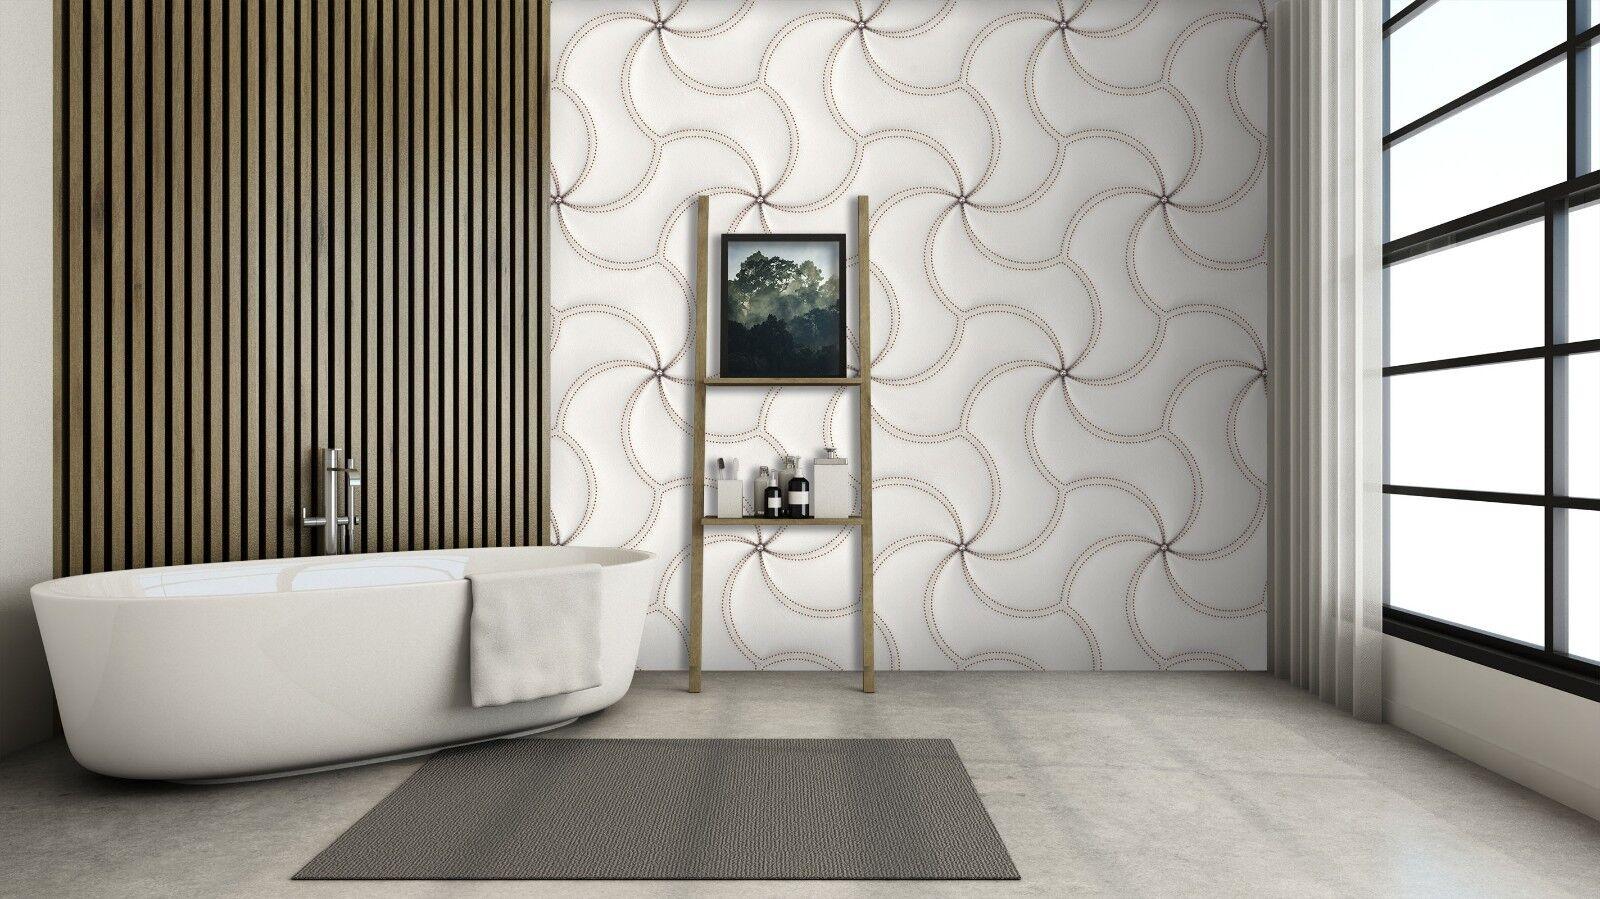 3D Small Diamond 84 Texture Tiles Marble Wall Paper Decal Wallpaper Mural AJ